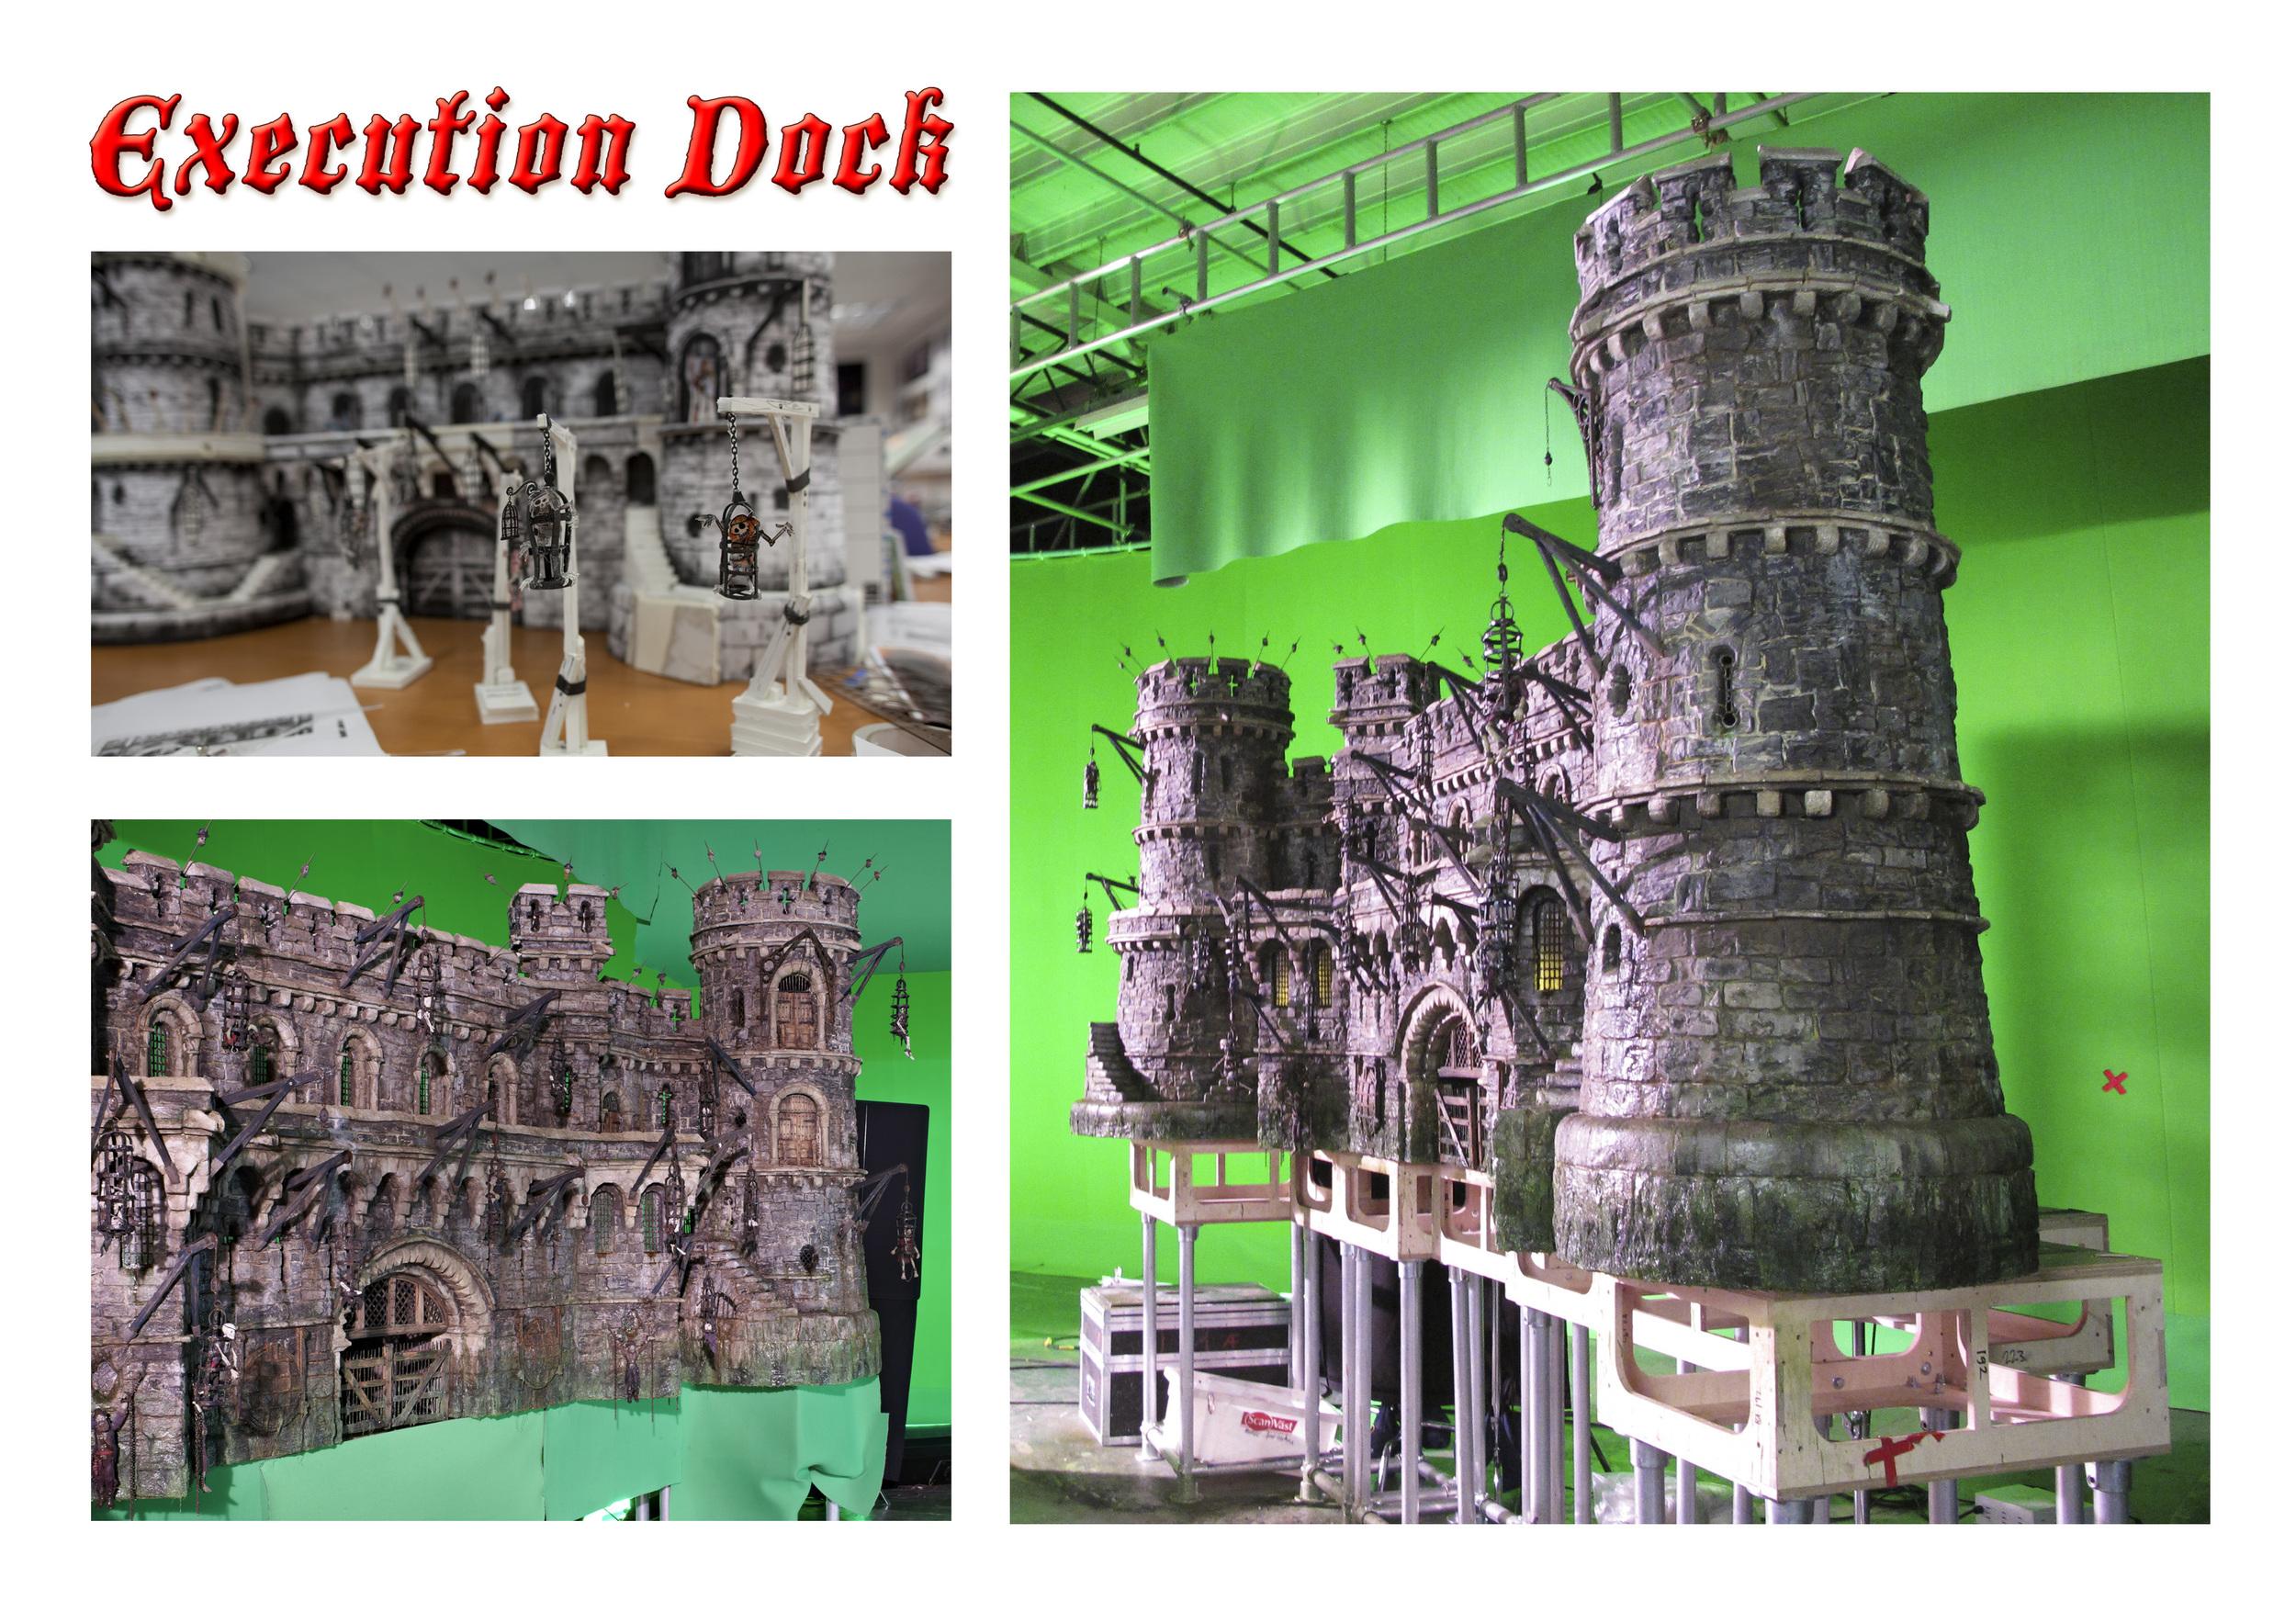 Execution_Dock_Photos.jpg